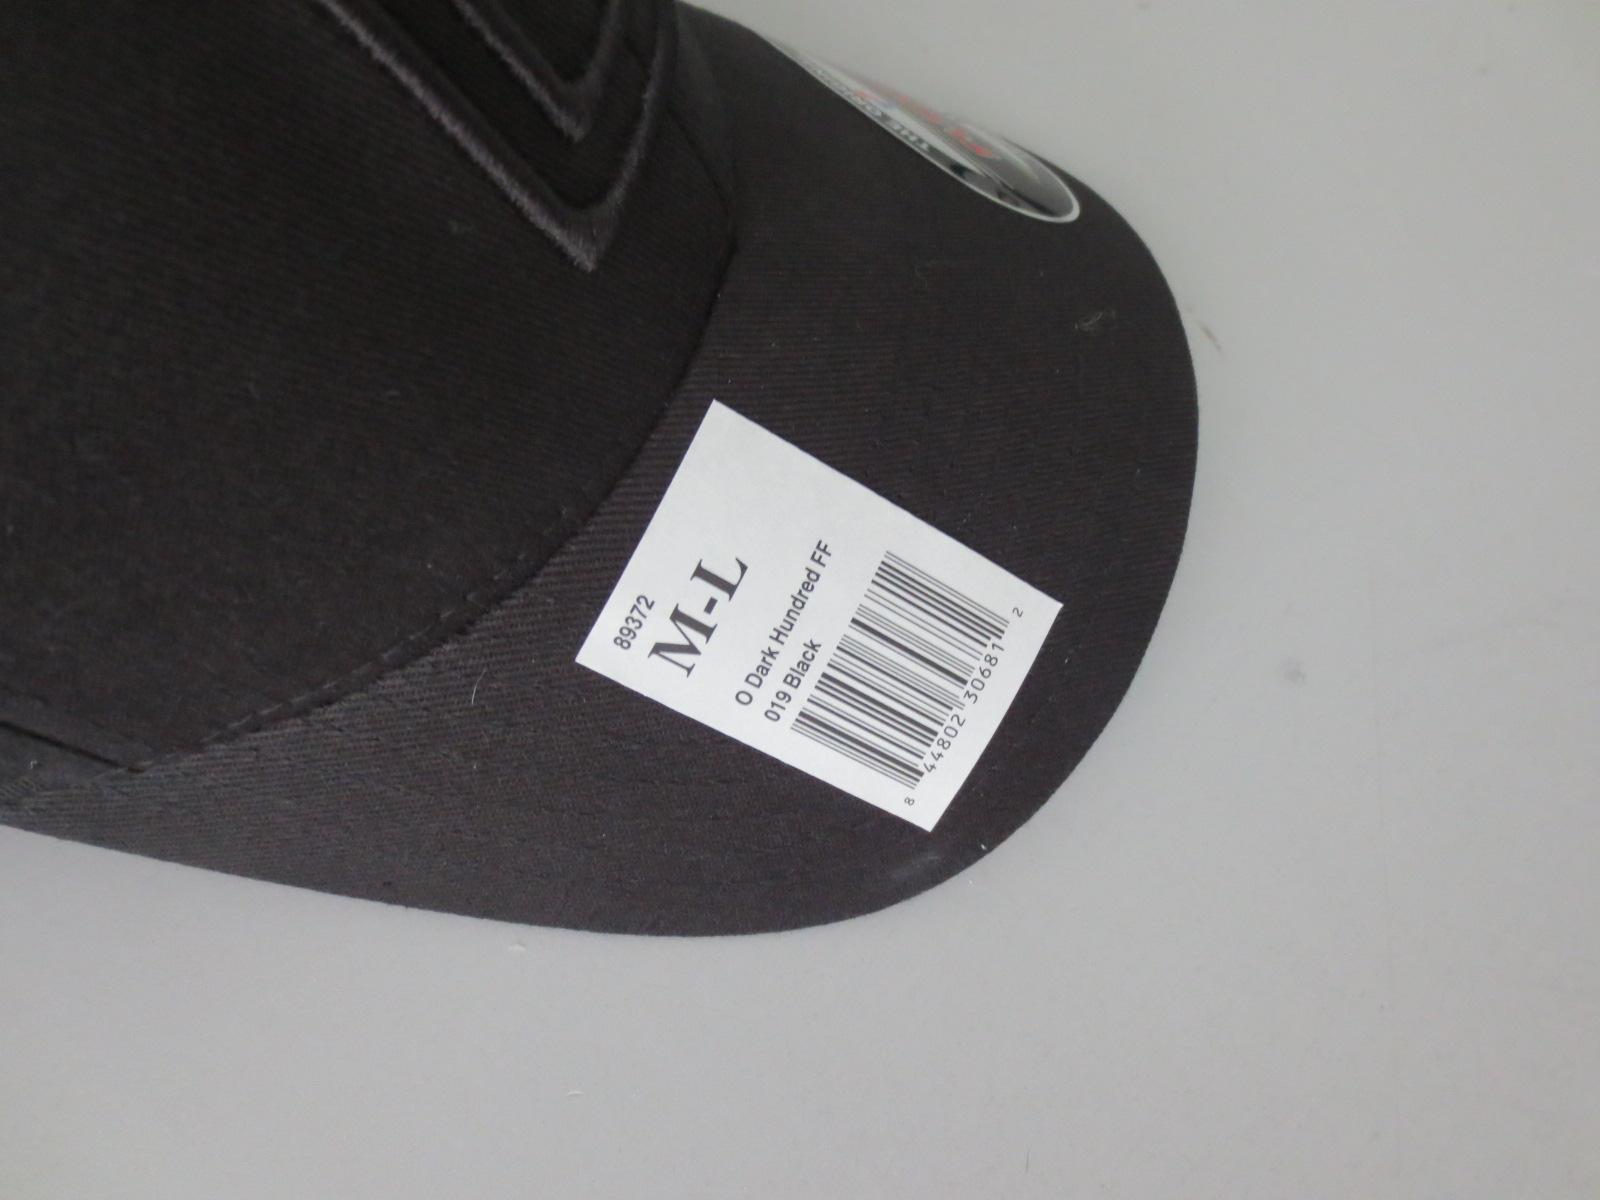 Шапки и кепки для туризма и кемпинга 5.11 5 /89372 511 3D 511 89372 5.11